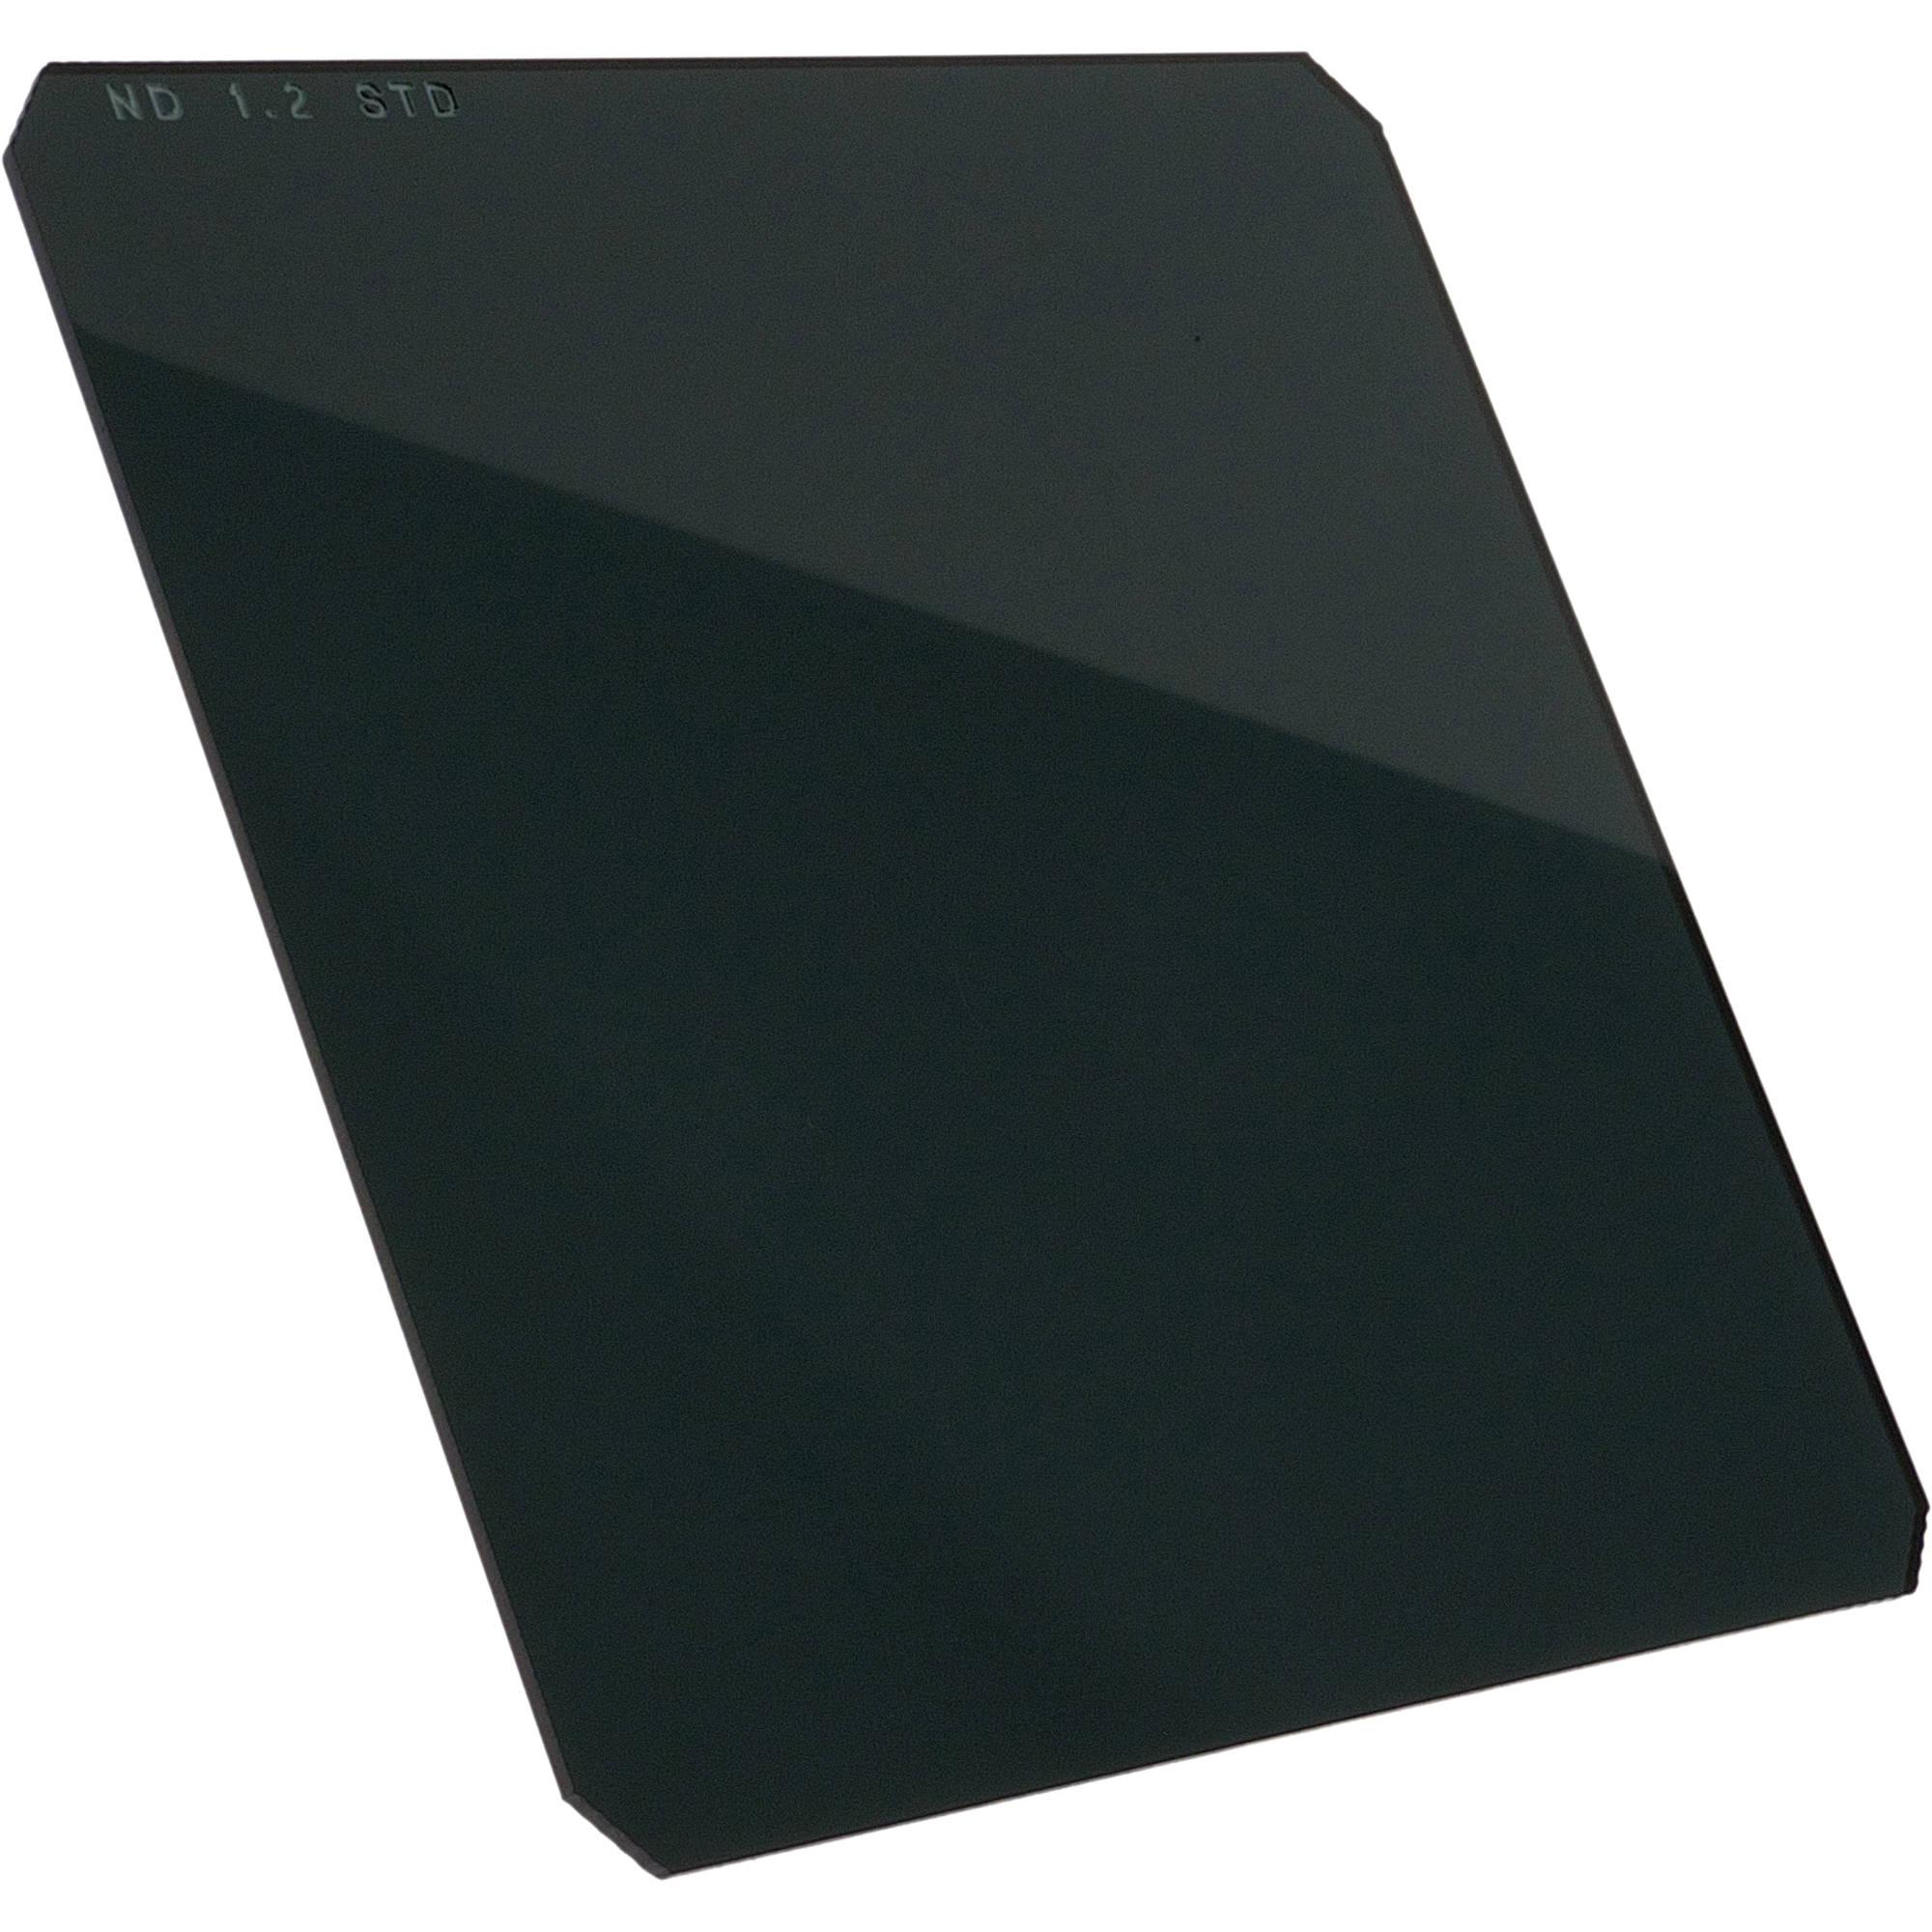 4-Inch x 5-Inch Formatt Hitech Limited HT100GPLU2 Plum 2 Soft Edge Filter